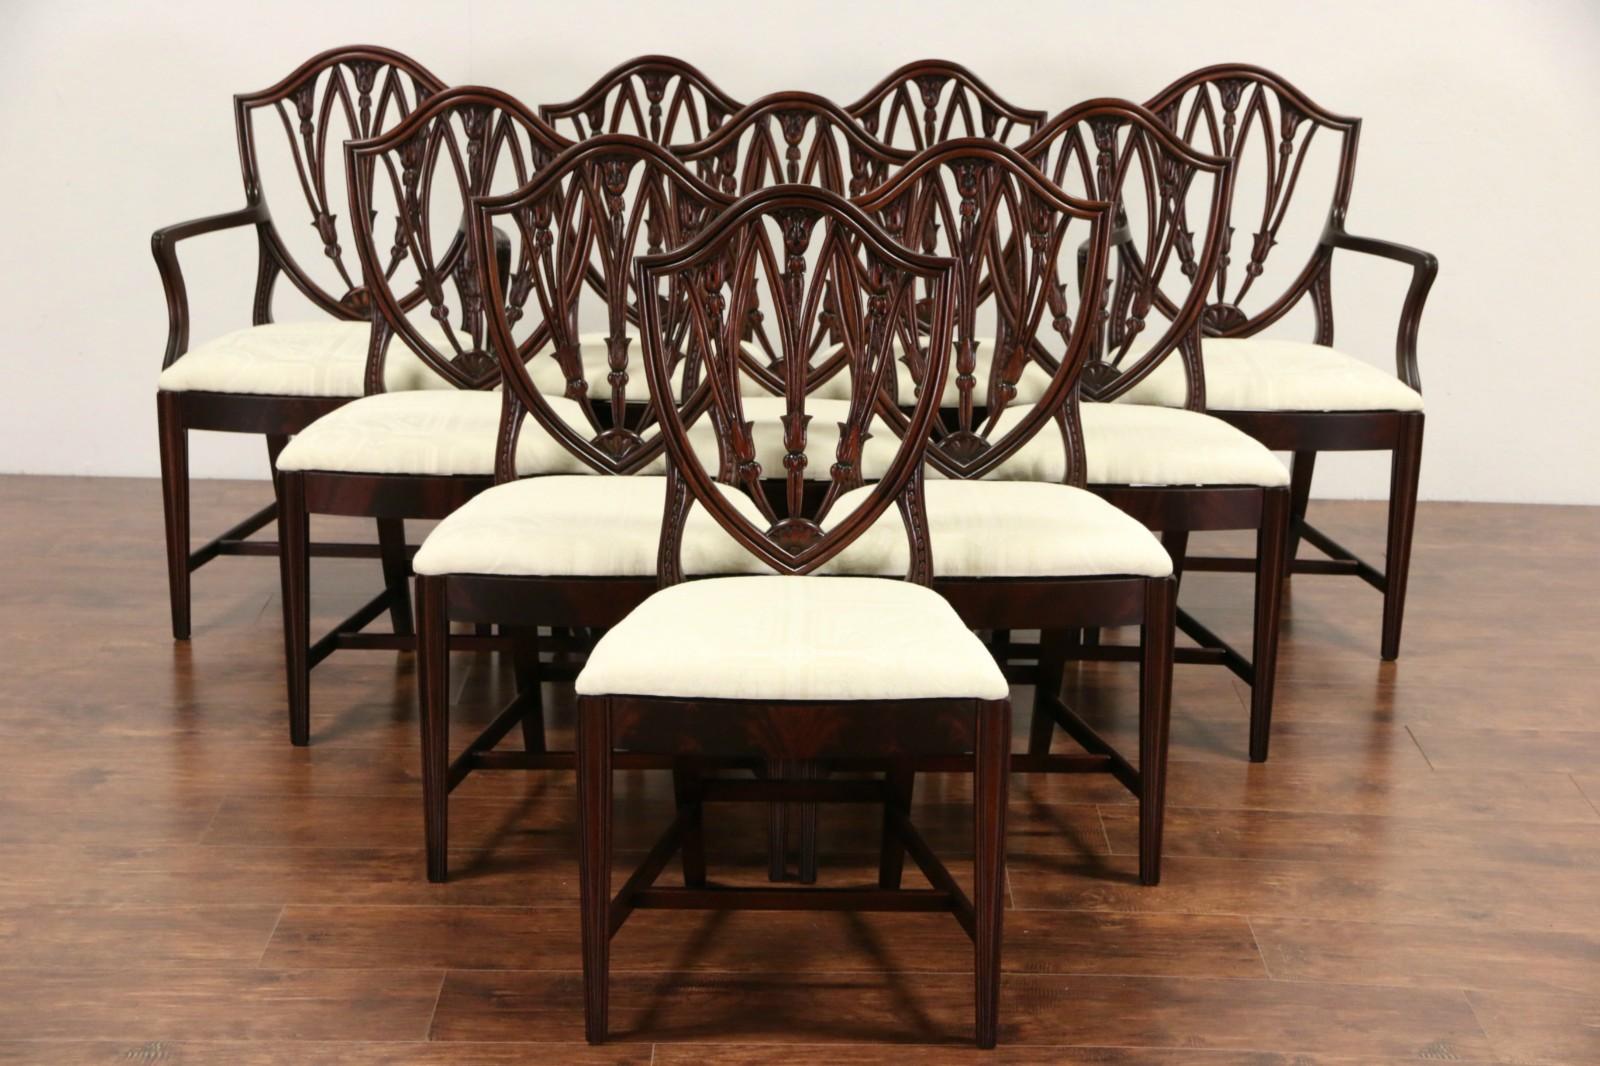 Set of 10 Shield Back 1940 Vintage Mahogany Dining Chairs New Upholstery & SOLD - Set of 10 Shield Back 1940 Vintage Mahogany Dining Chairs ...